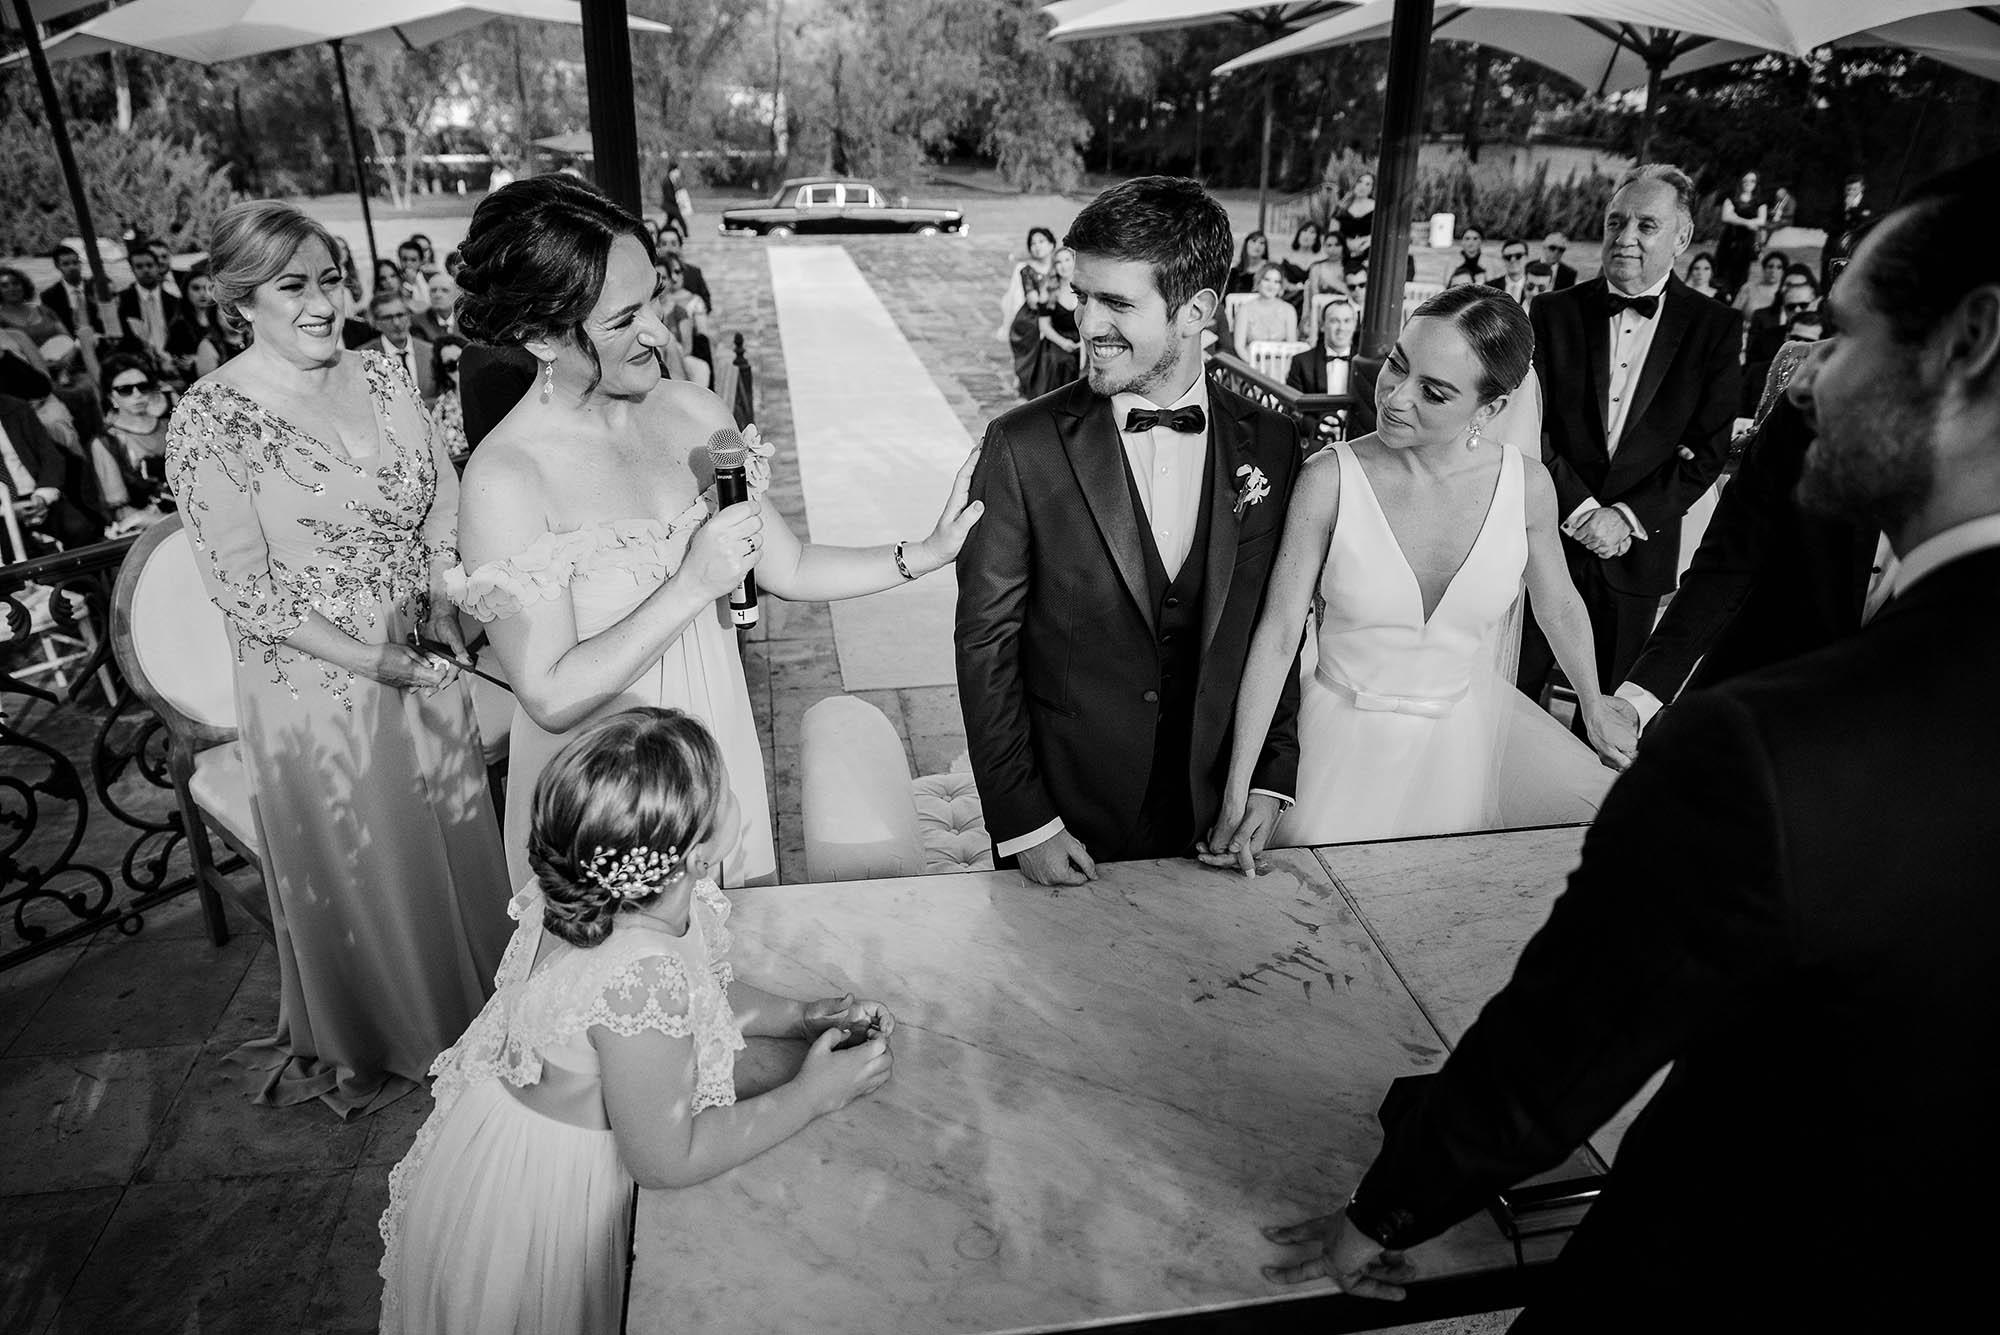 magali fotografo hacienda escoba guadalajara boda wedding 13.jpg